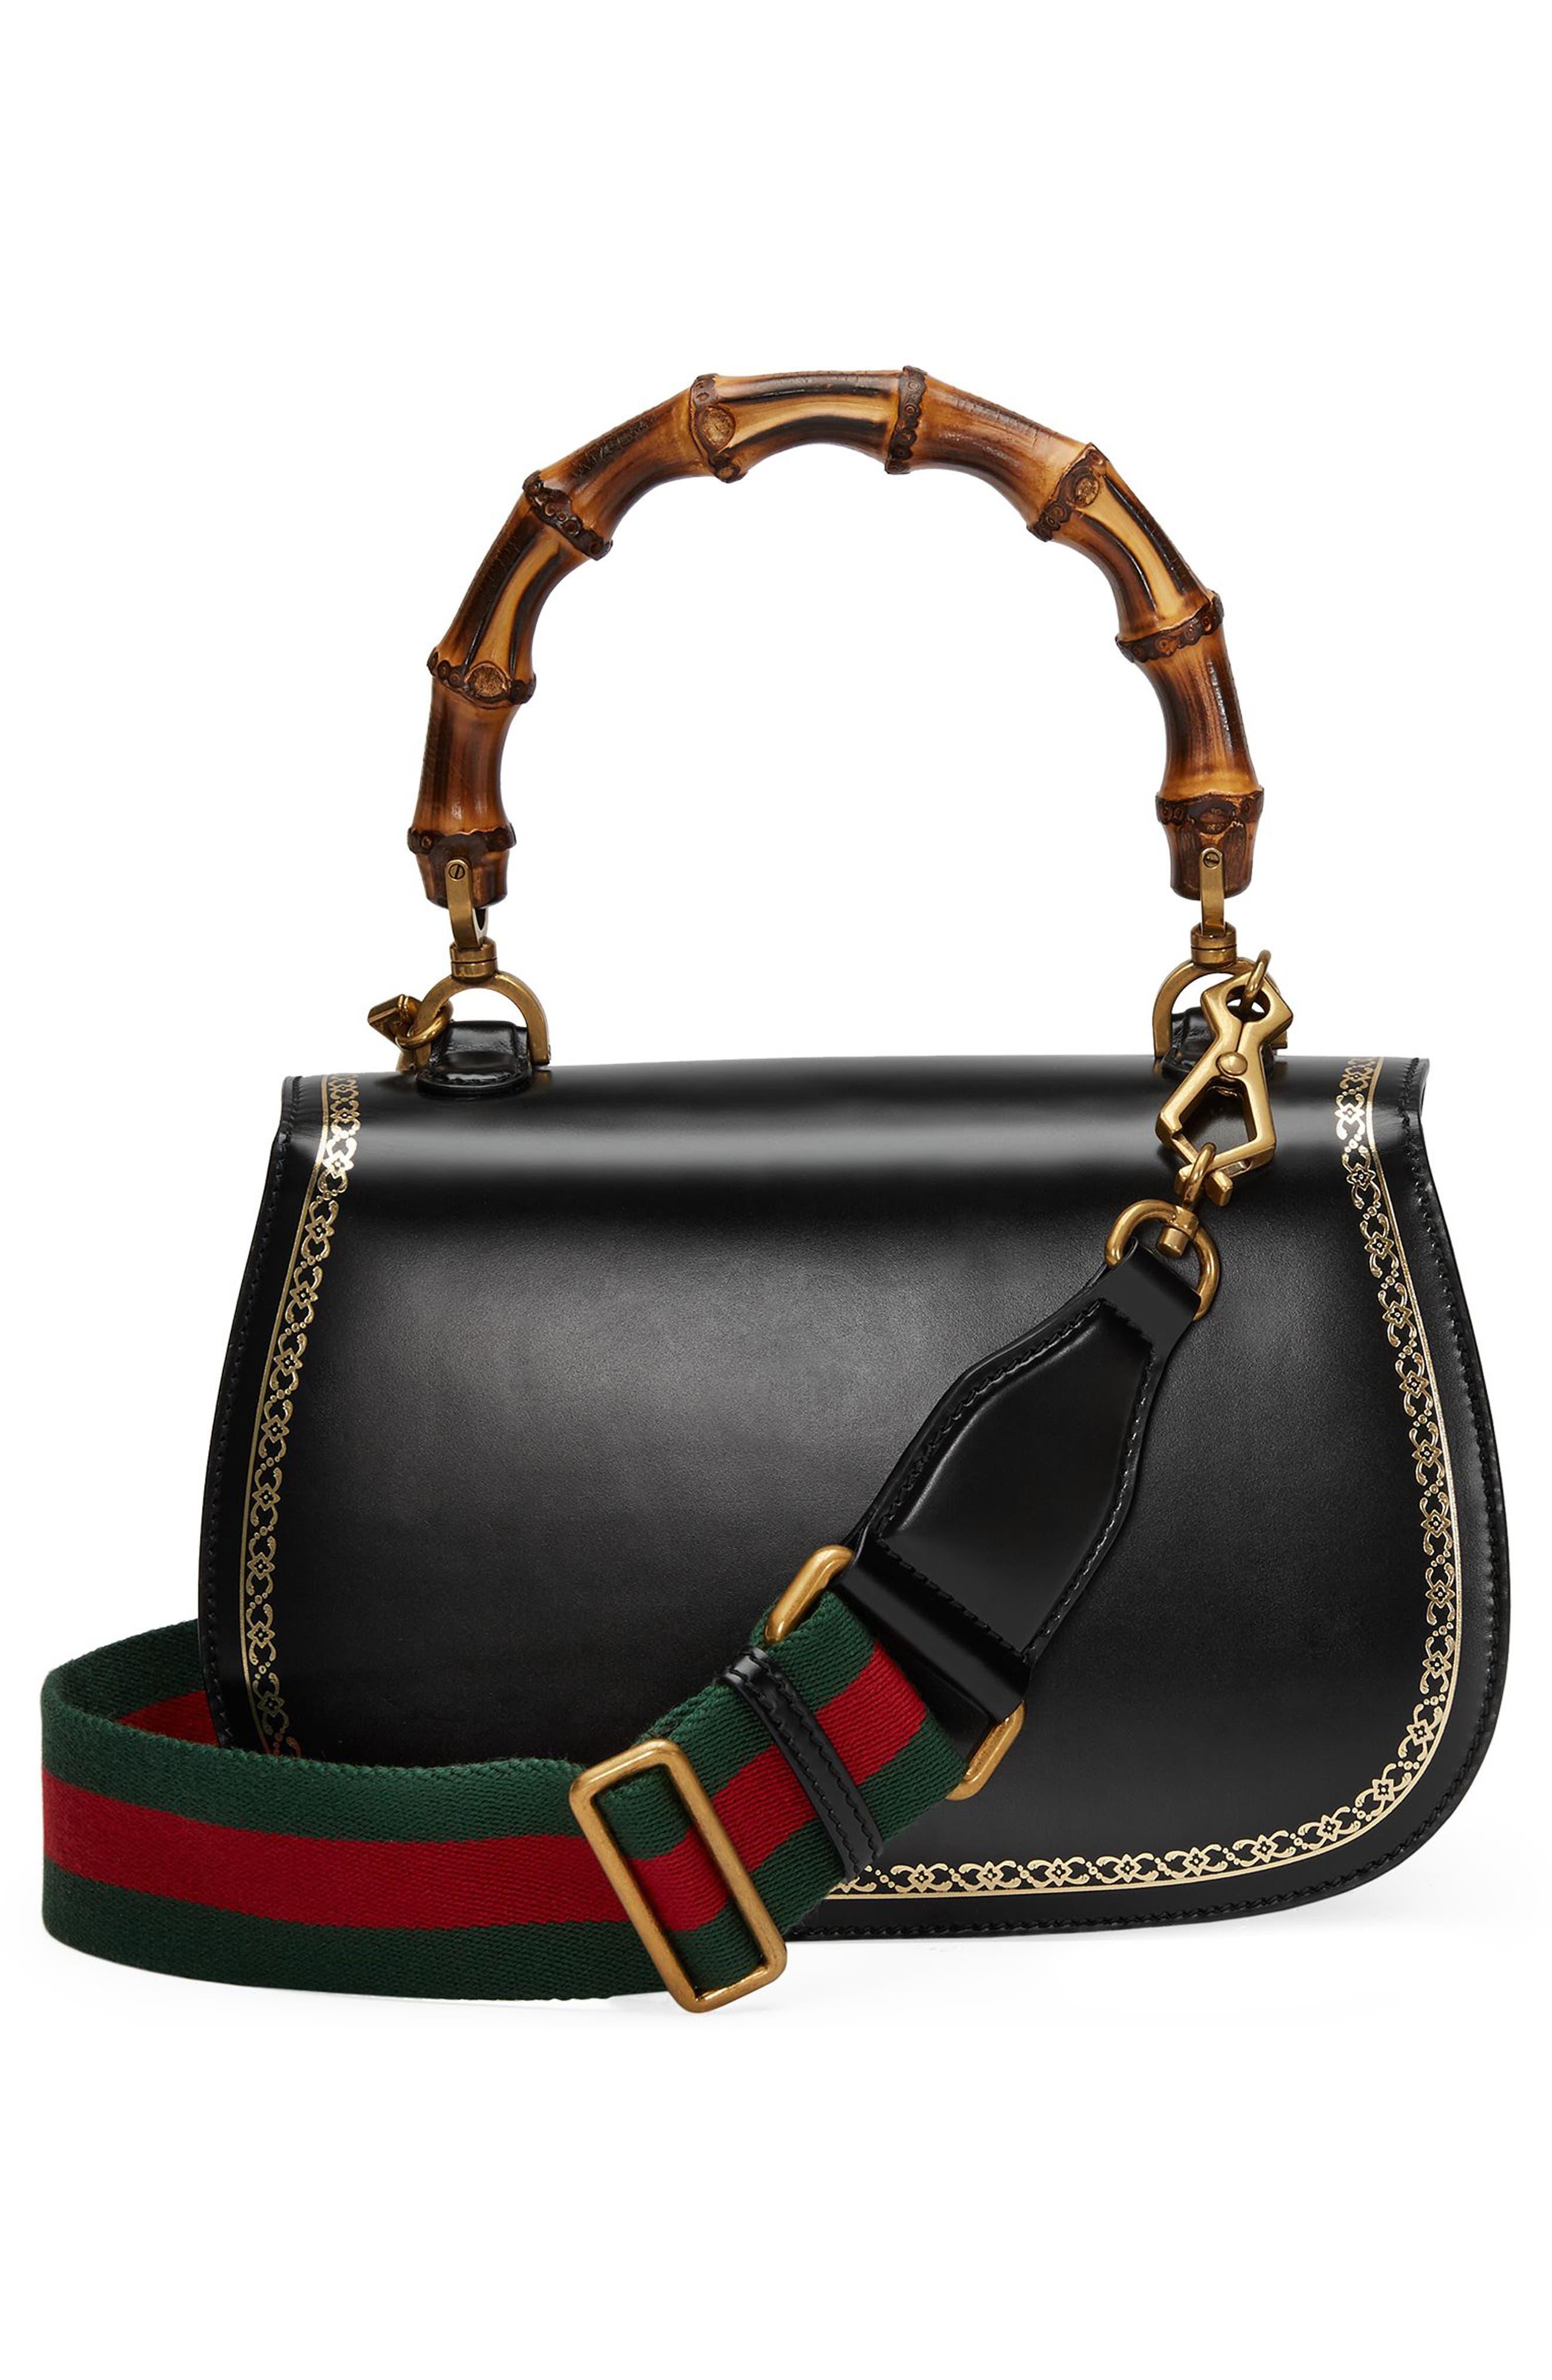 Medium Classic 2 Top Handle Shoulder Bag,                             Alternate thumbnail 2, color,